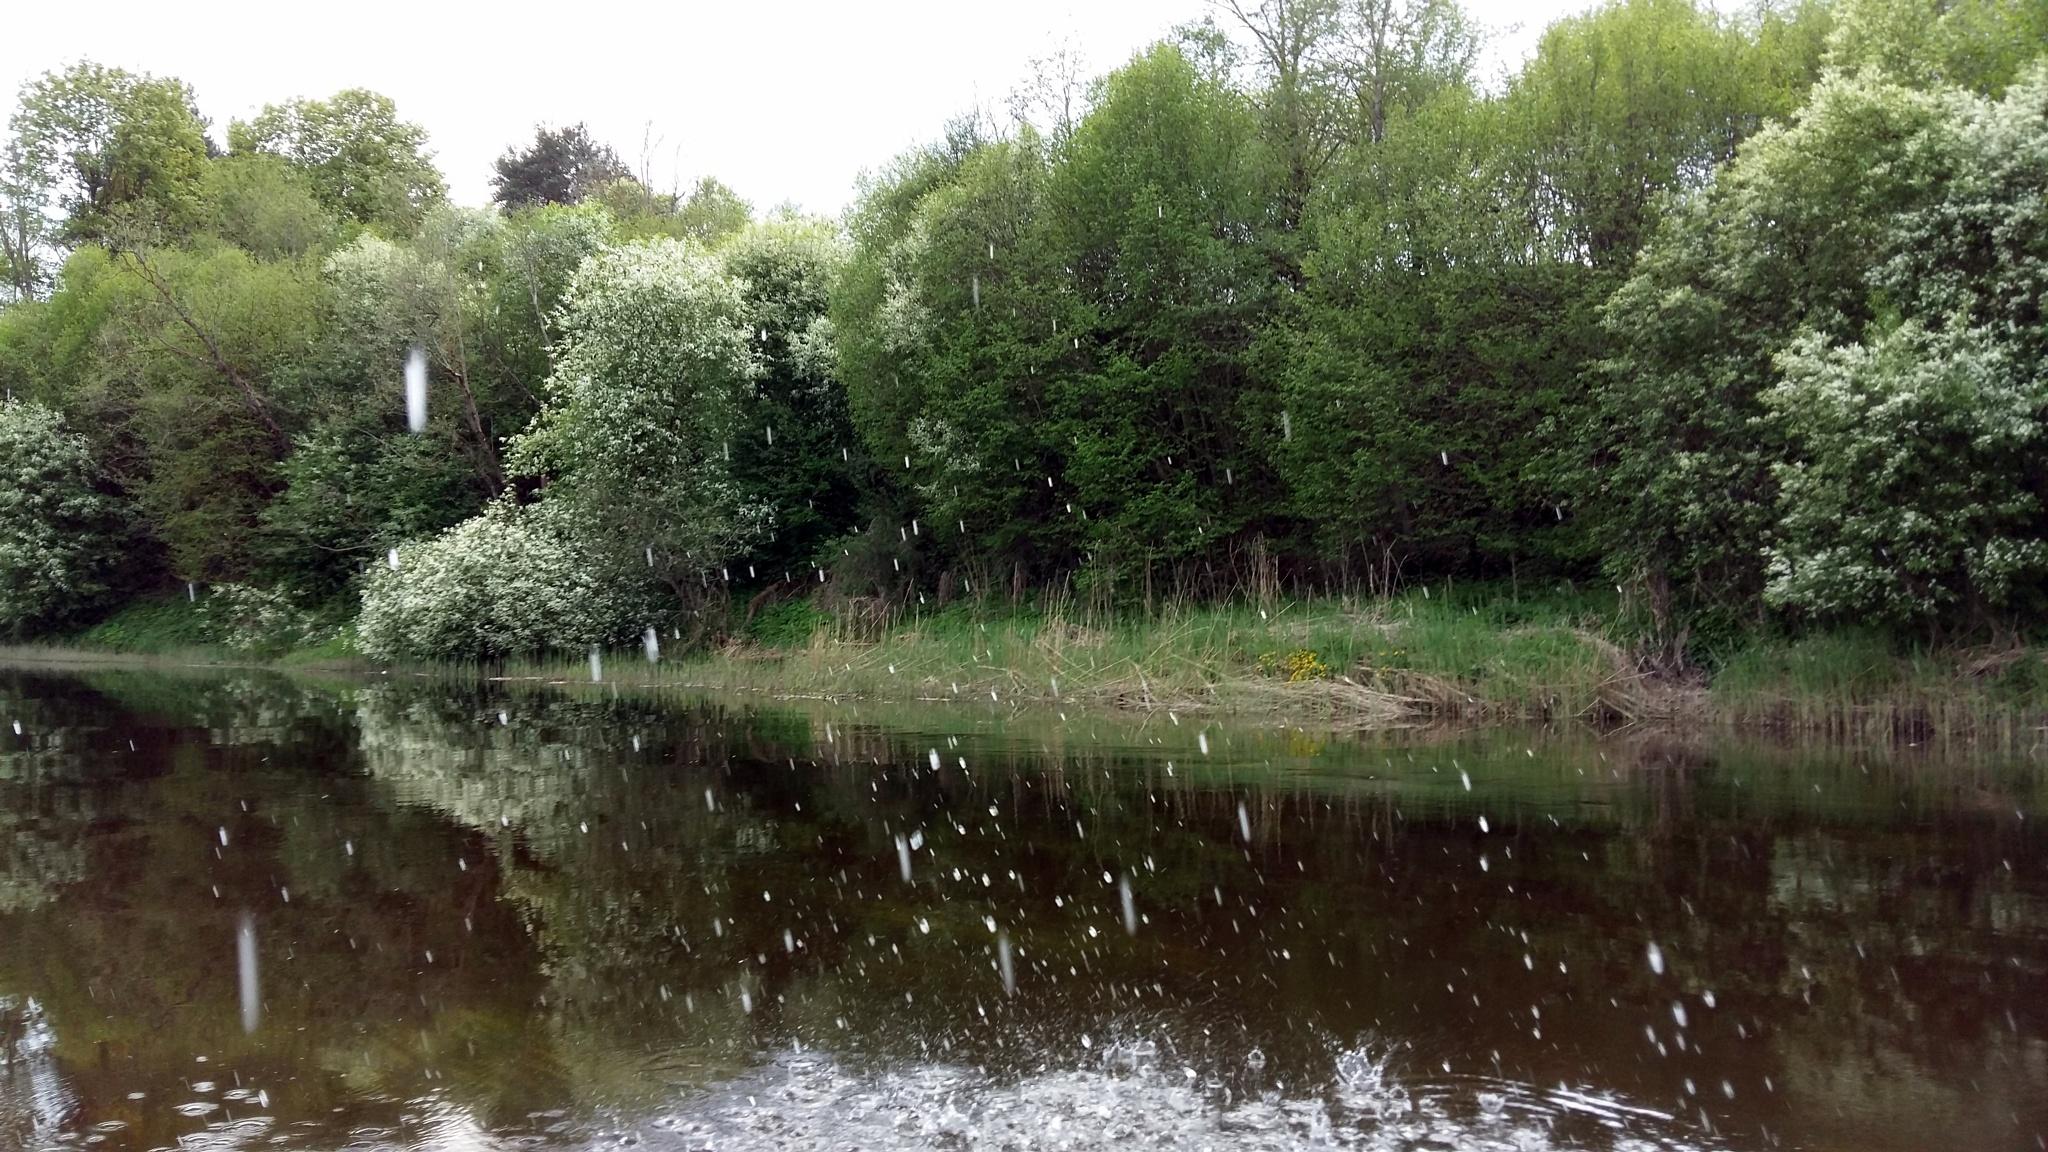 Spring riverside by uzkuraitiene62